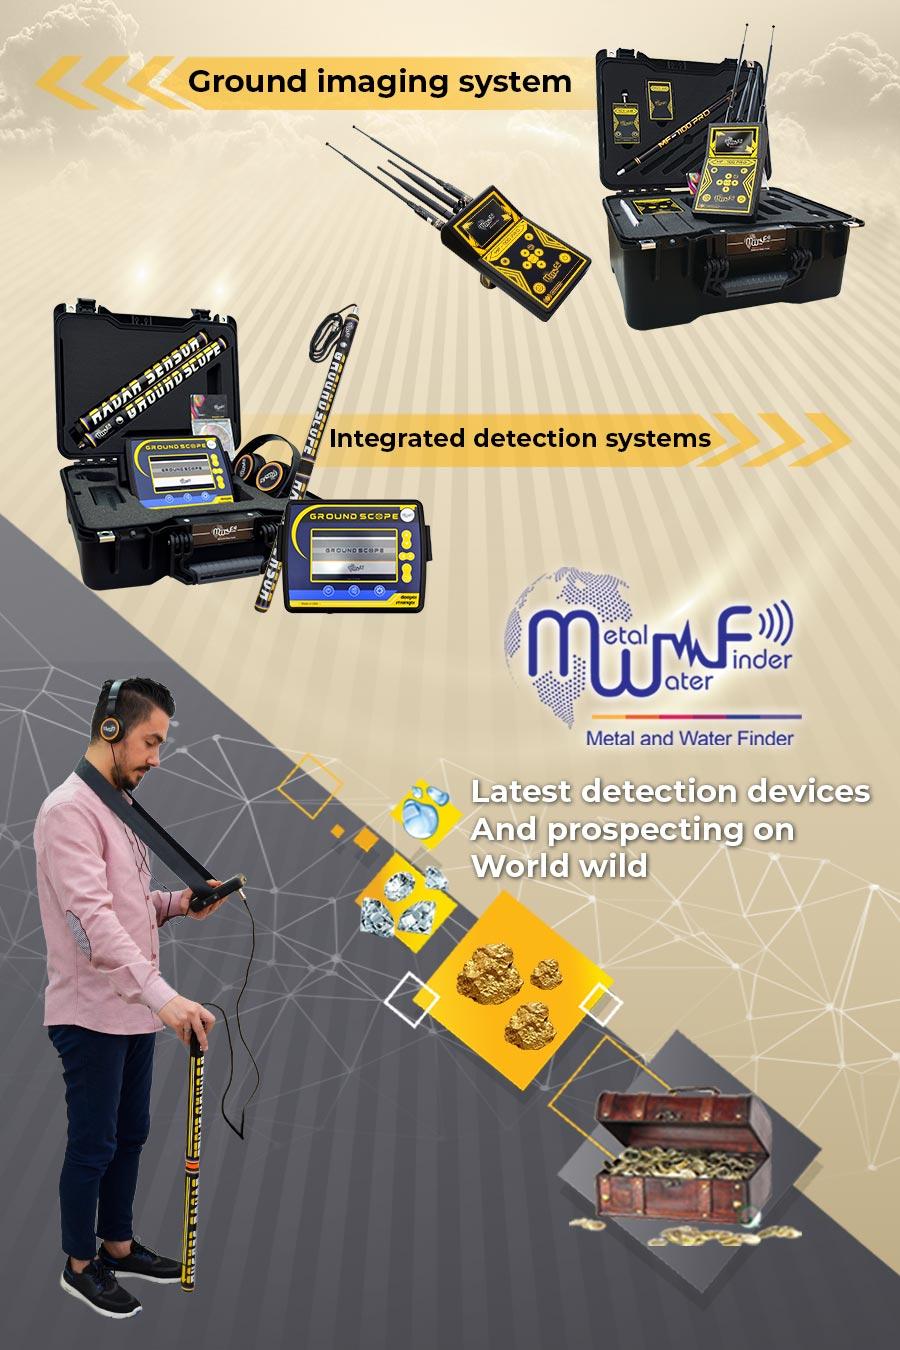 mwf-mobile-en